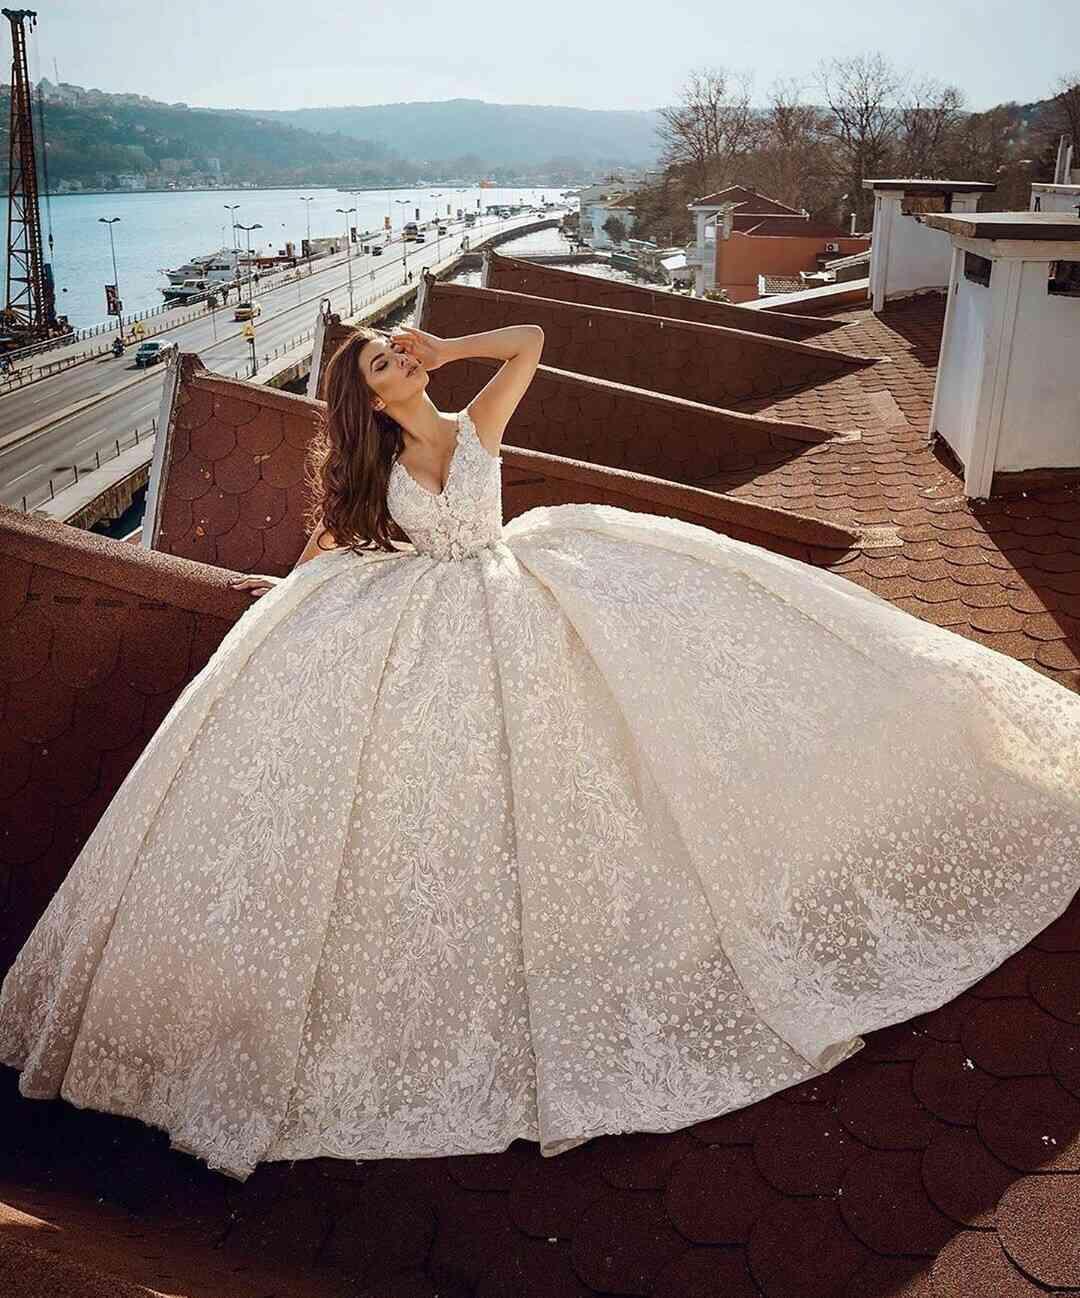 Arabic Ball Gown Luxury Wedding Dresses 2021 Appliqued Beading Plus Size Bridal Gowns V Neck Customise vestido de novia